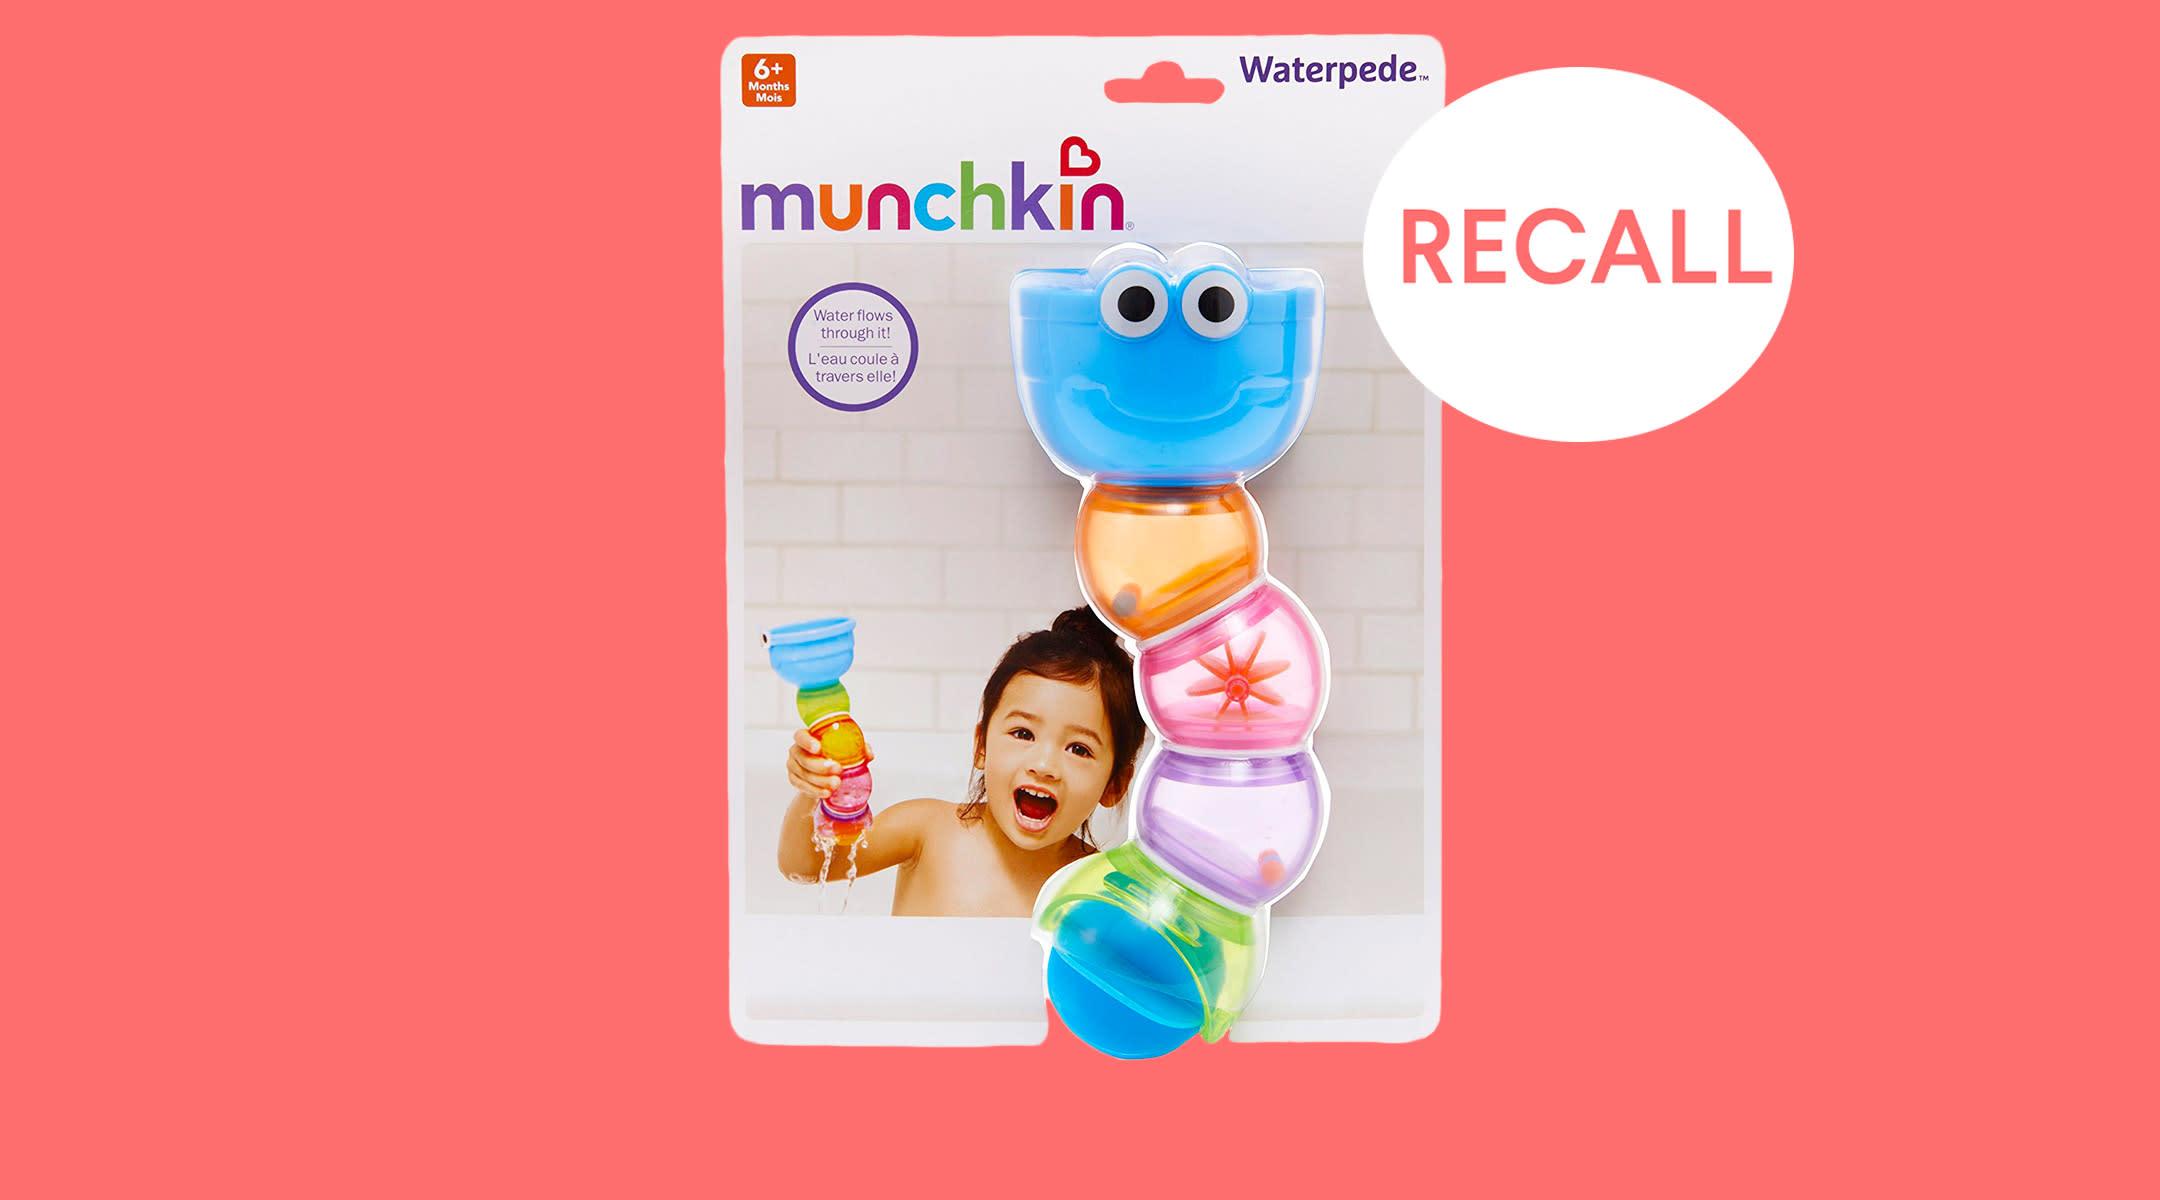 Munchkin Recalls Waterpede Bath Toys